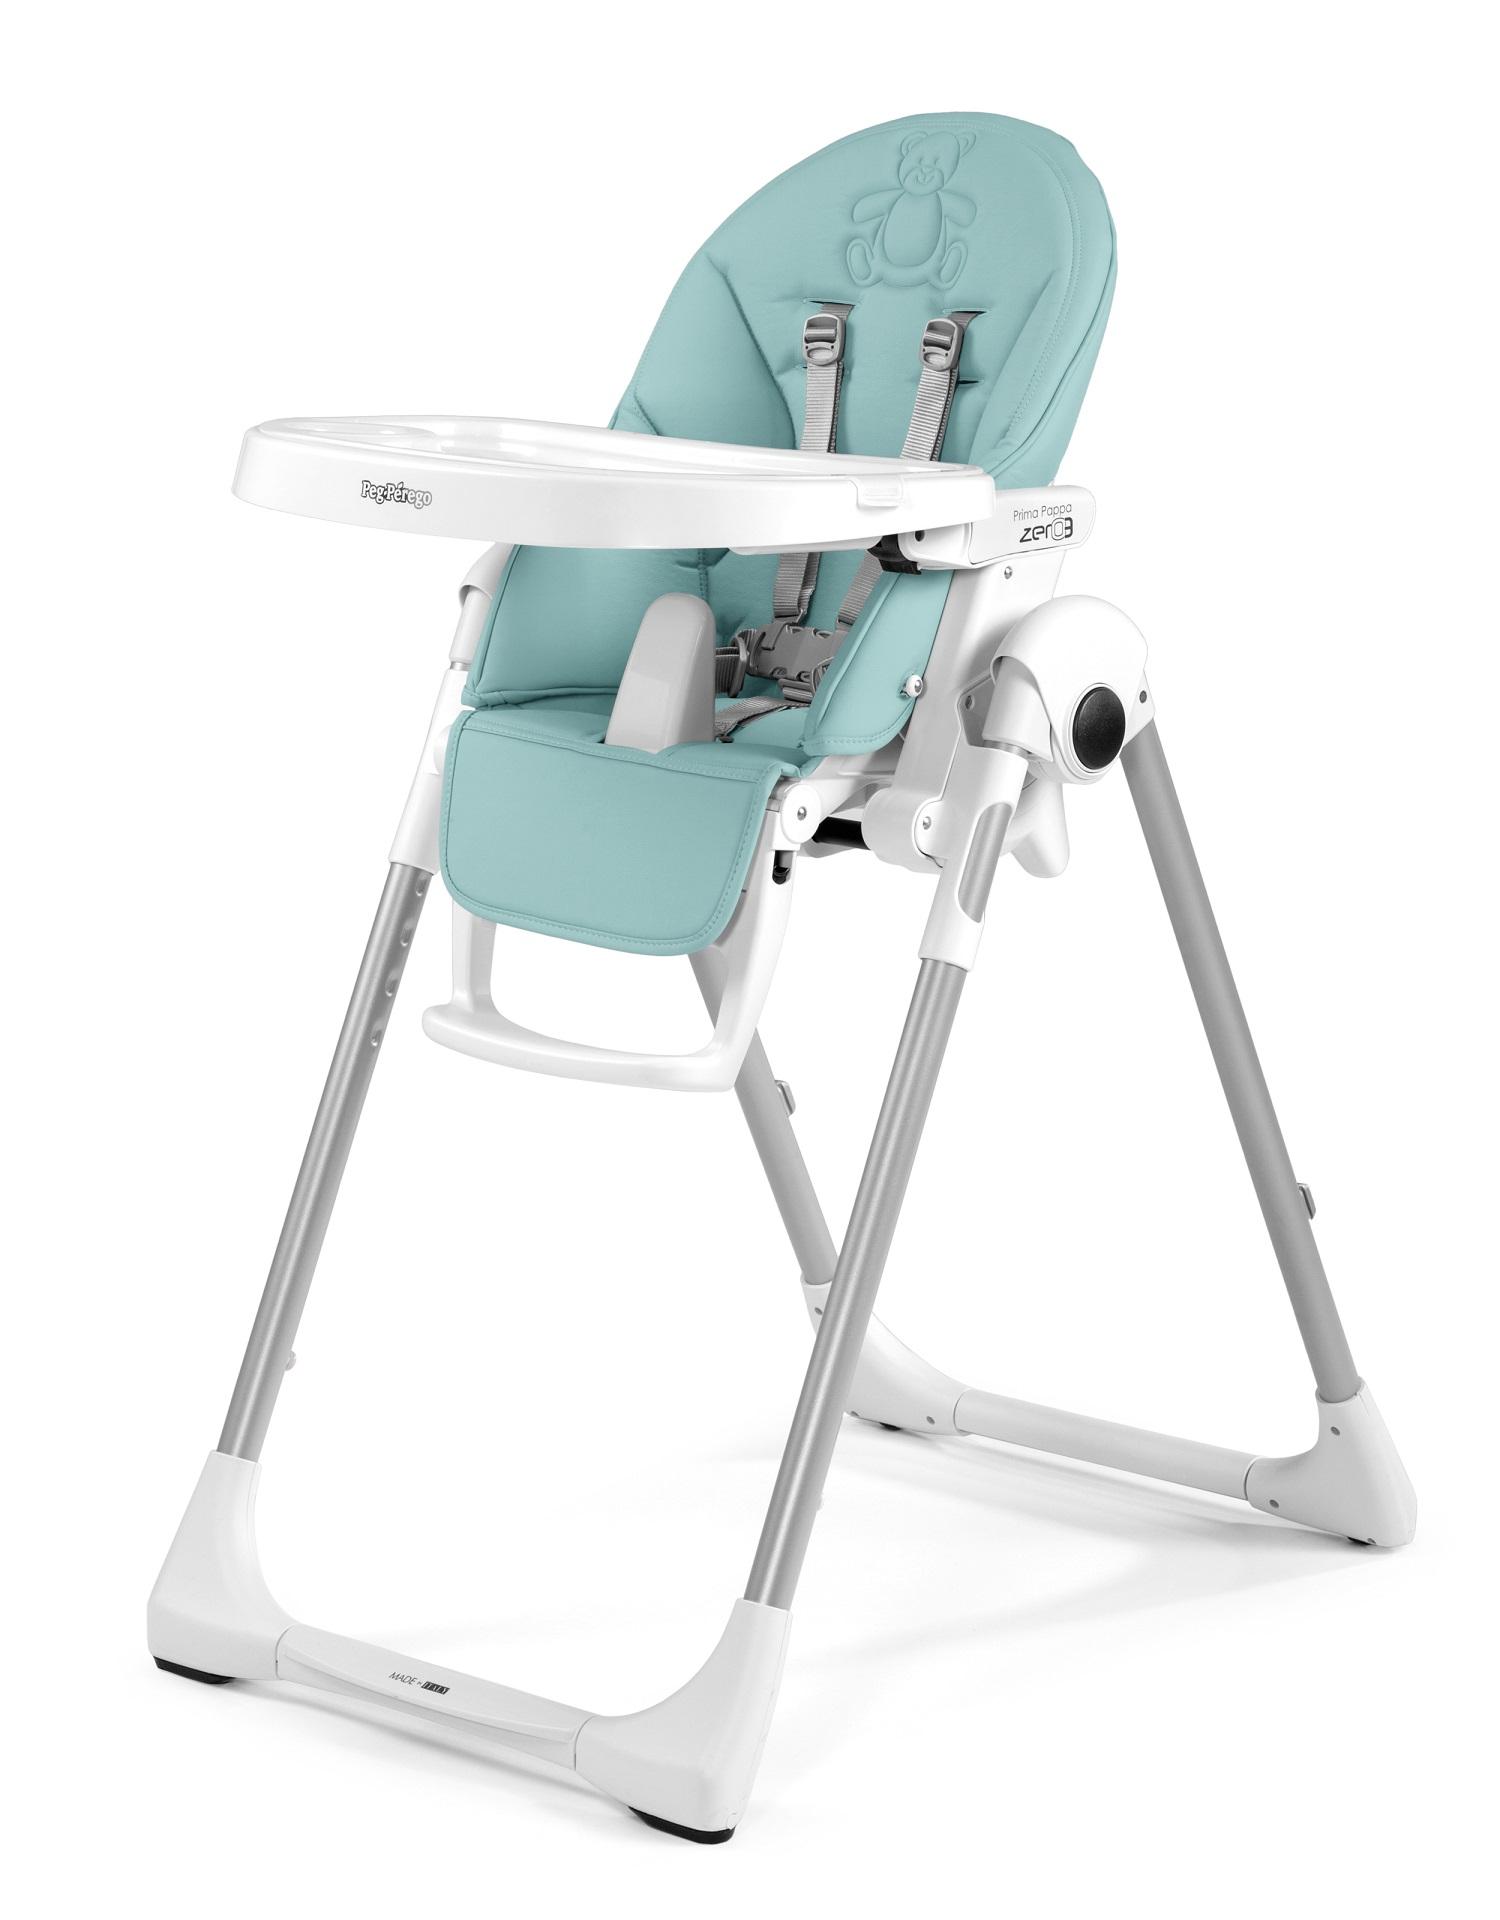 peg perego tatamia high chair contemporary bar chairs prima pappa zero3 2018 bear azul